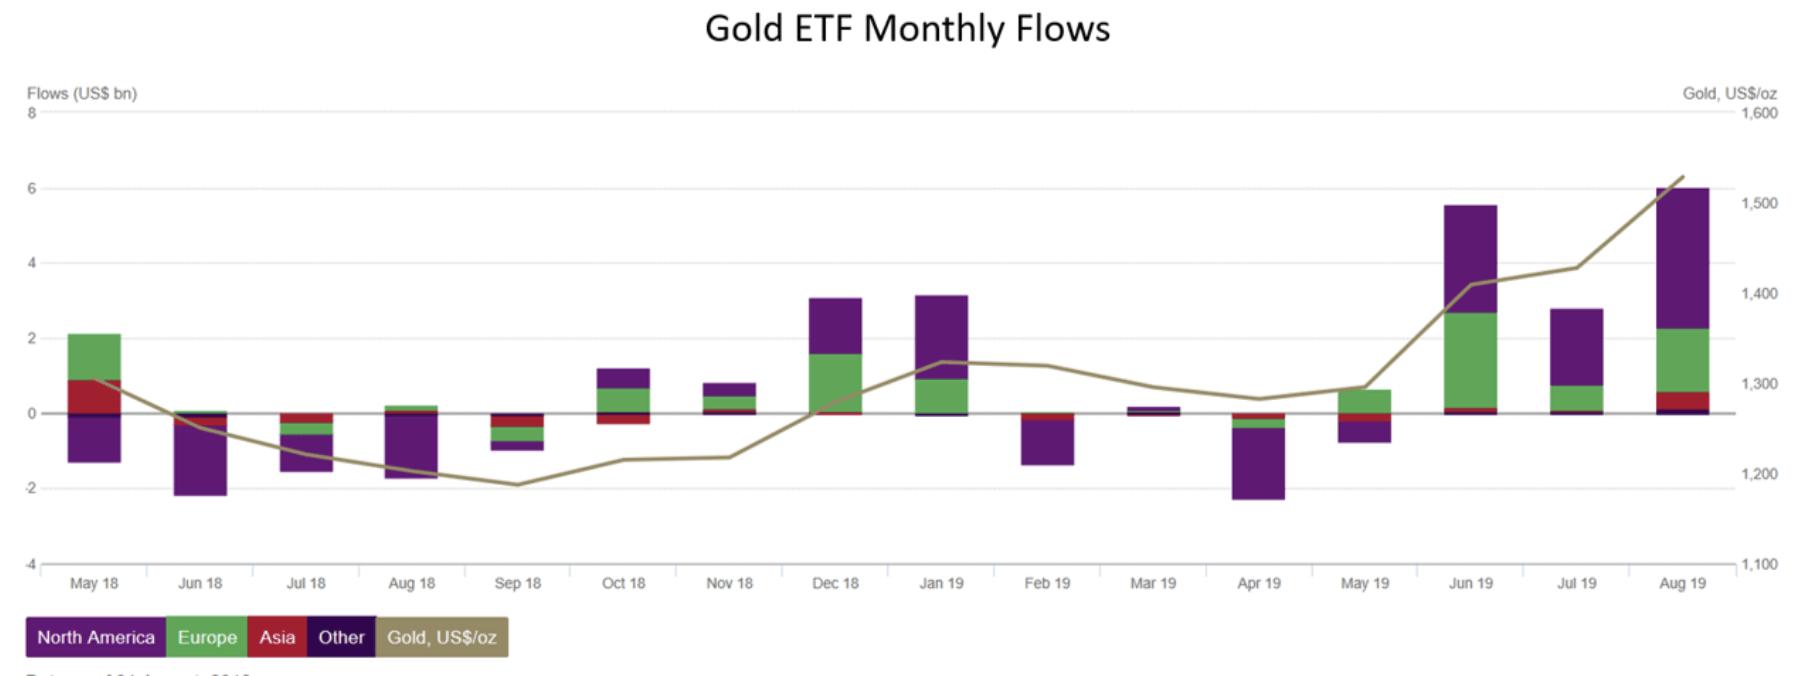 Gold ETF Flows